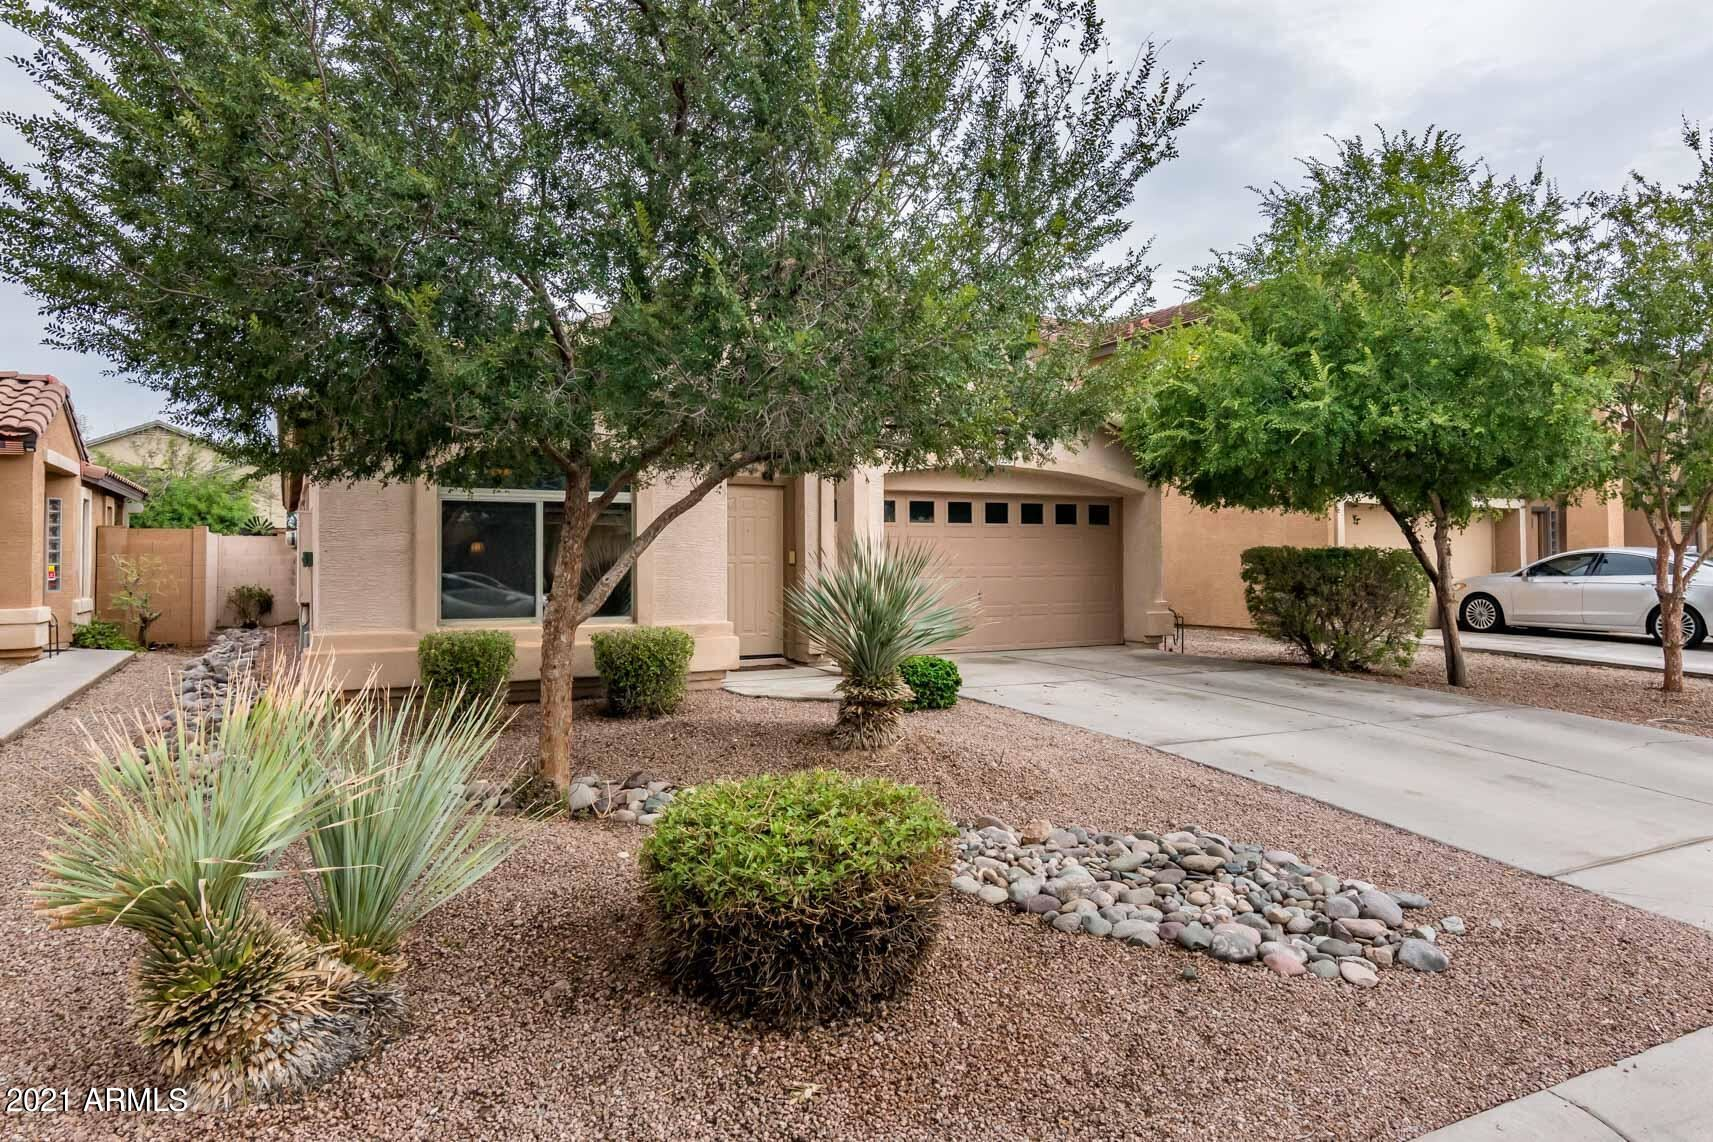 Photo of 1336 E SHARI Street, San Tan Valley, AZ 85140 (MLS # 6266333)